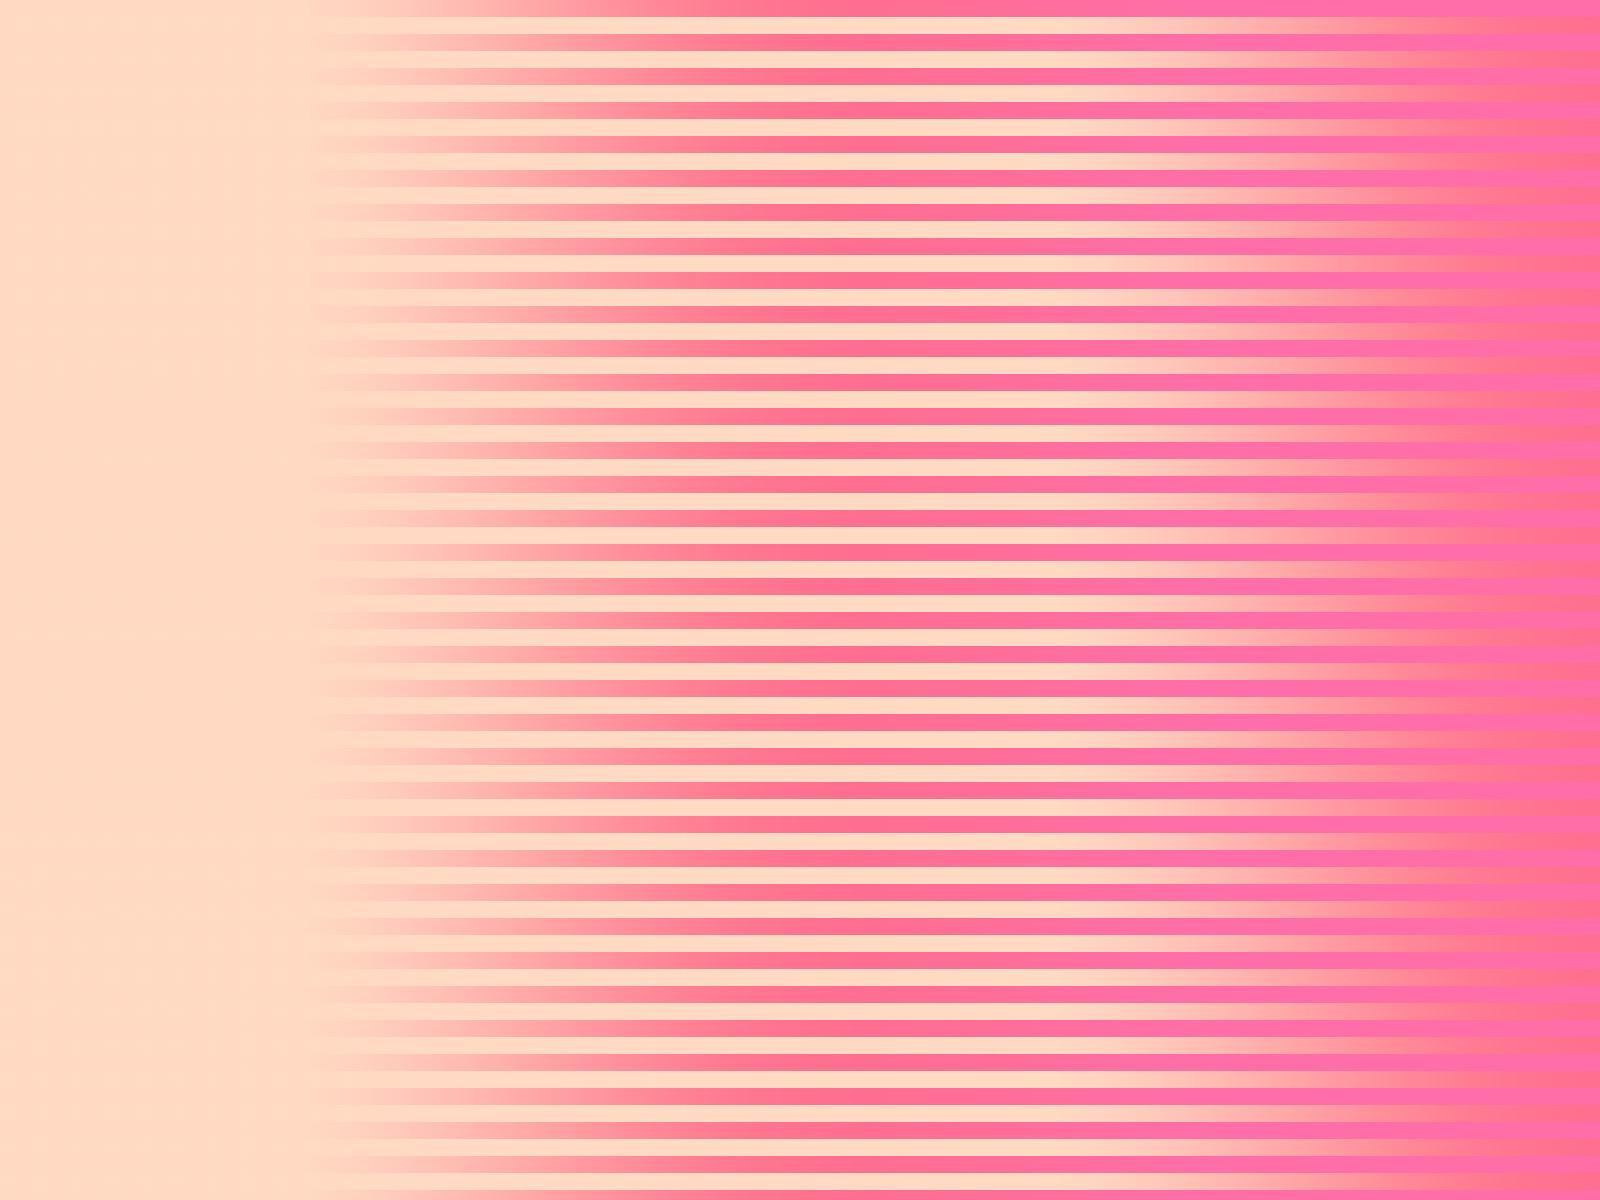 Stripe Wallpaper Pink Peach Colour Part 2